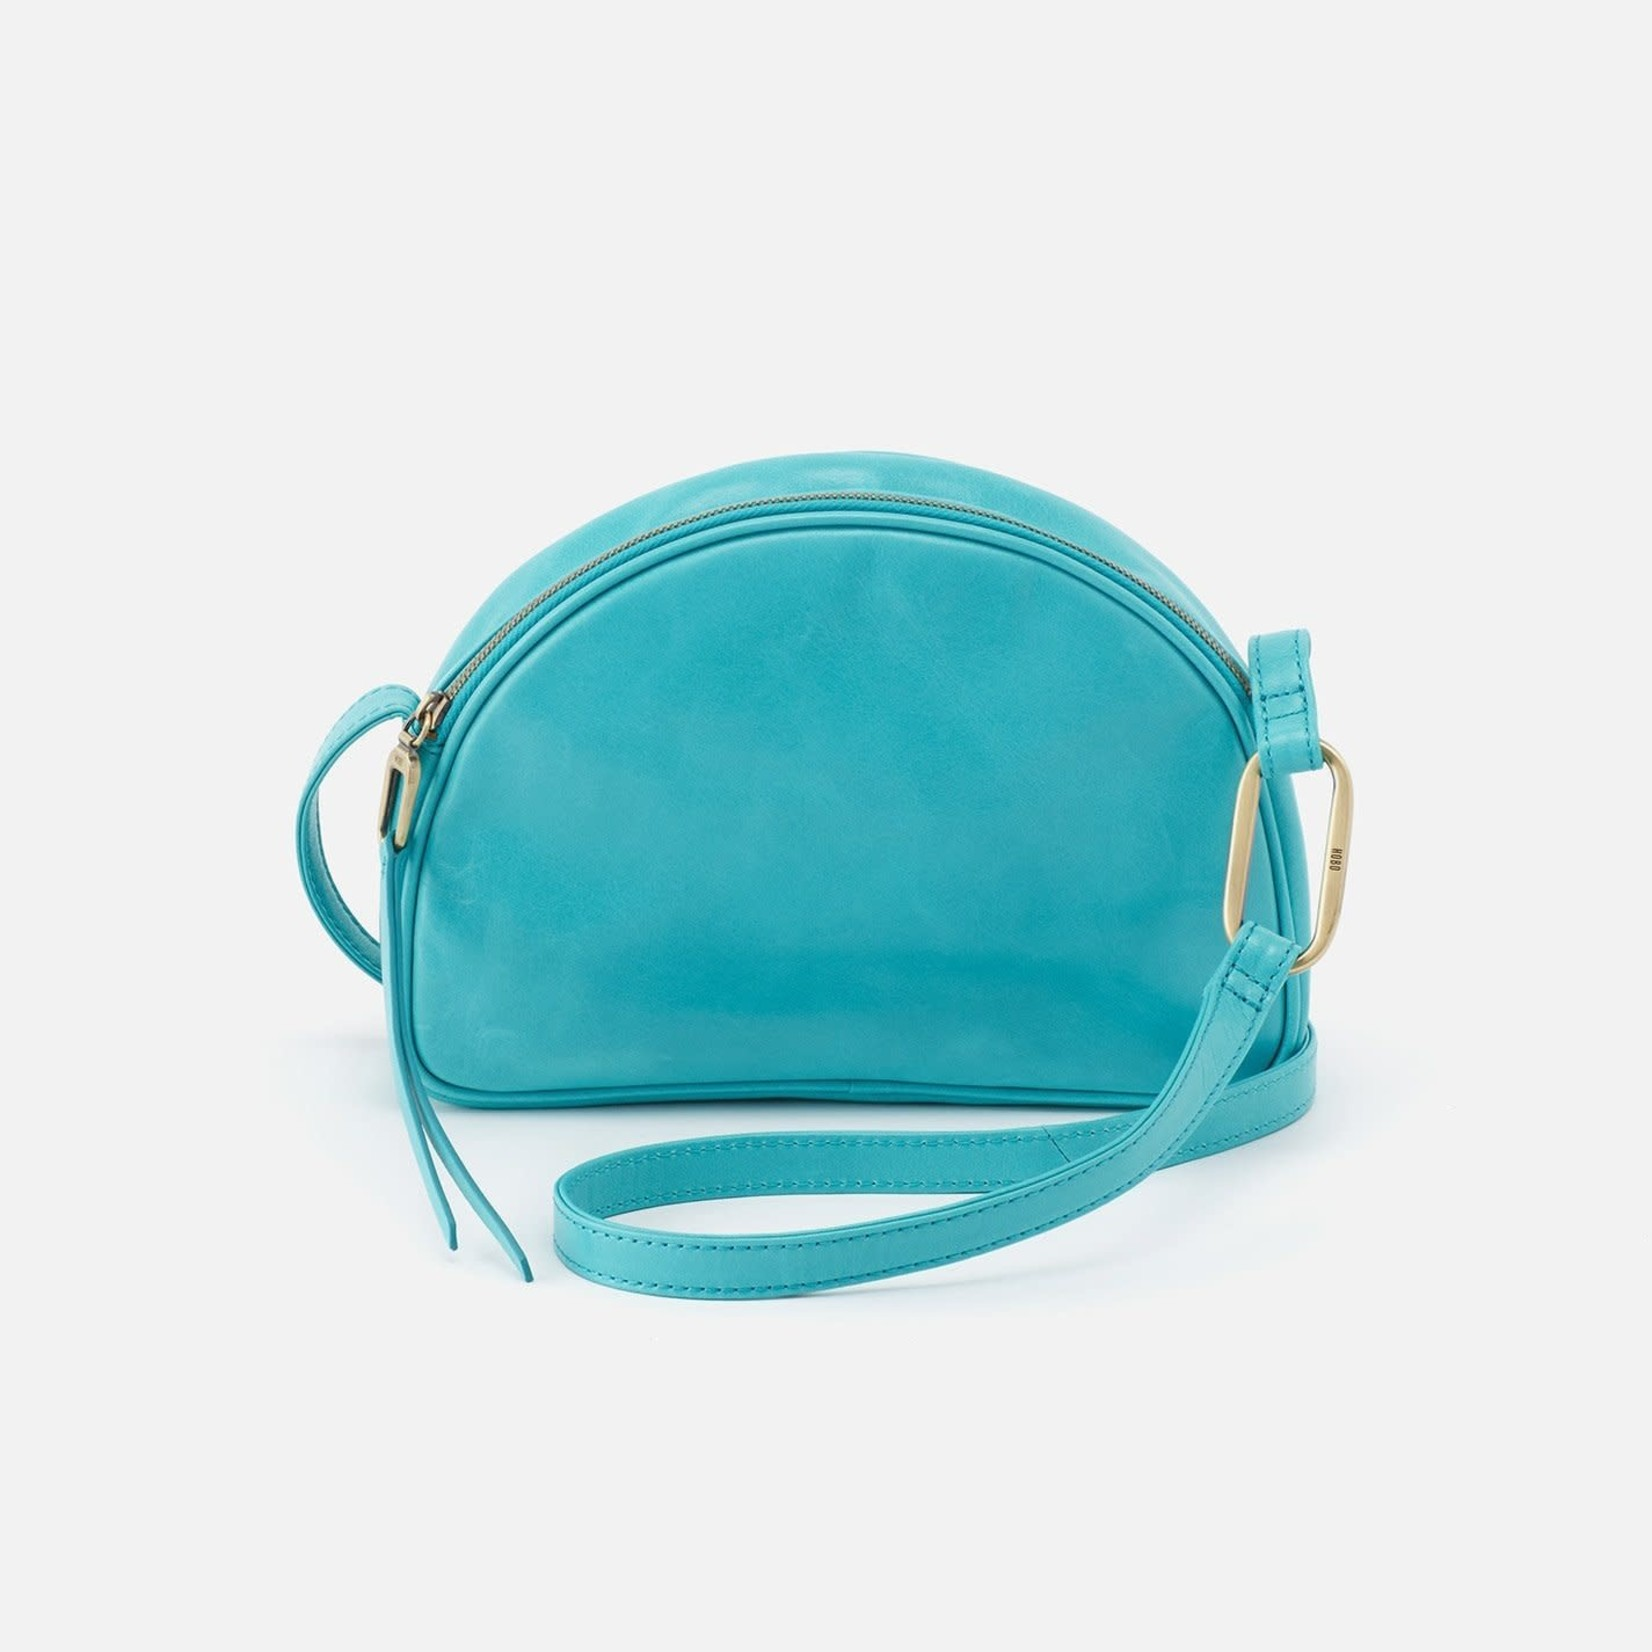 HOBO Reach Aqua Vintage Hide Leather Crossbody